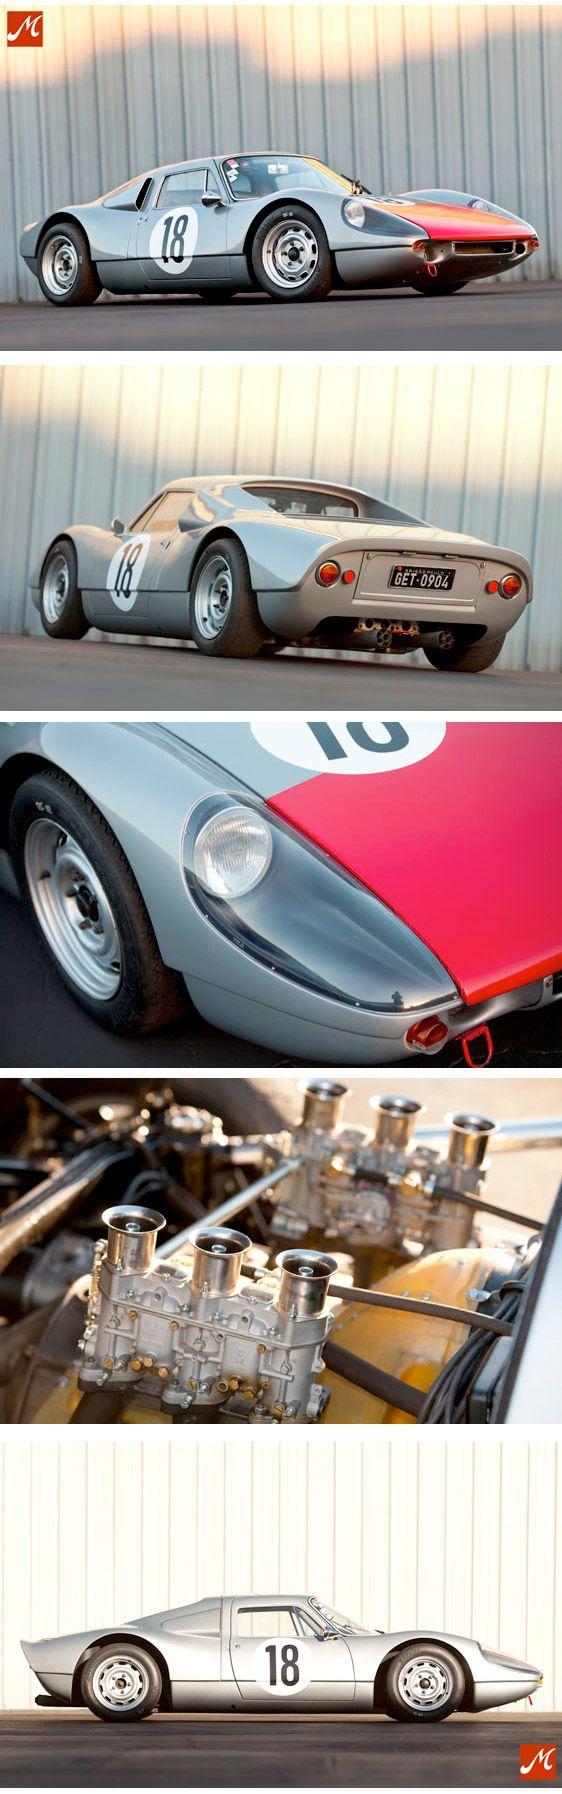 1963 Porsche 904/6 Carrera GTS Factory Works